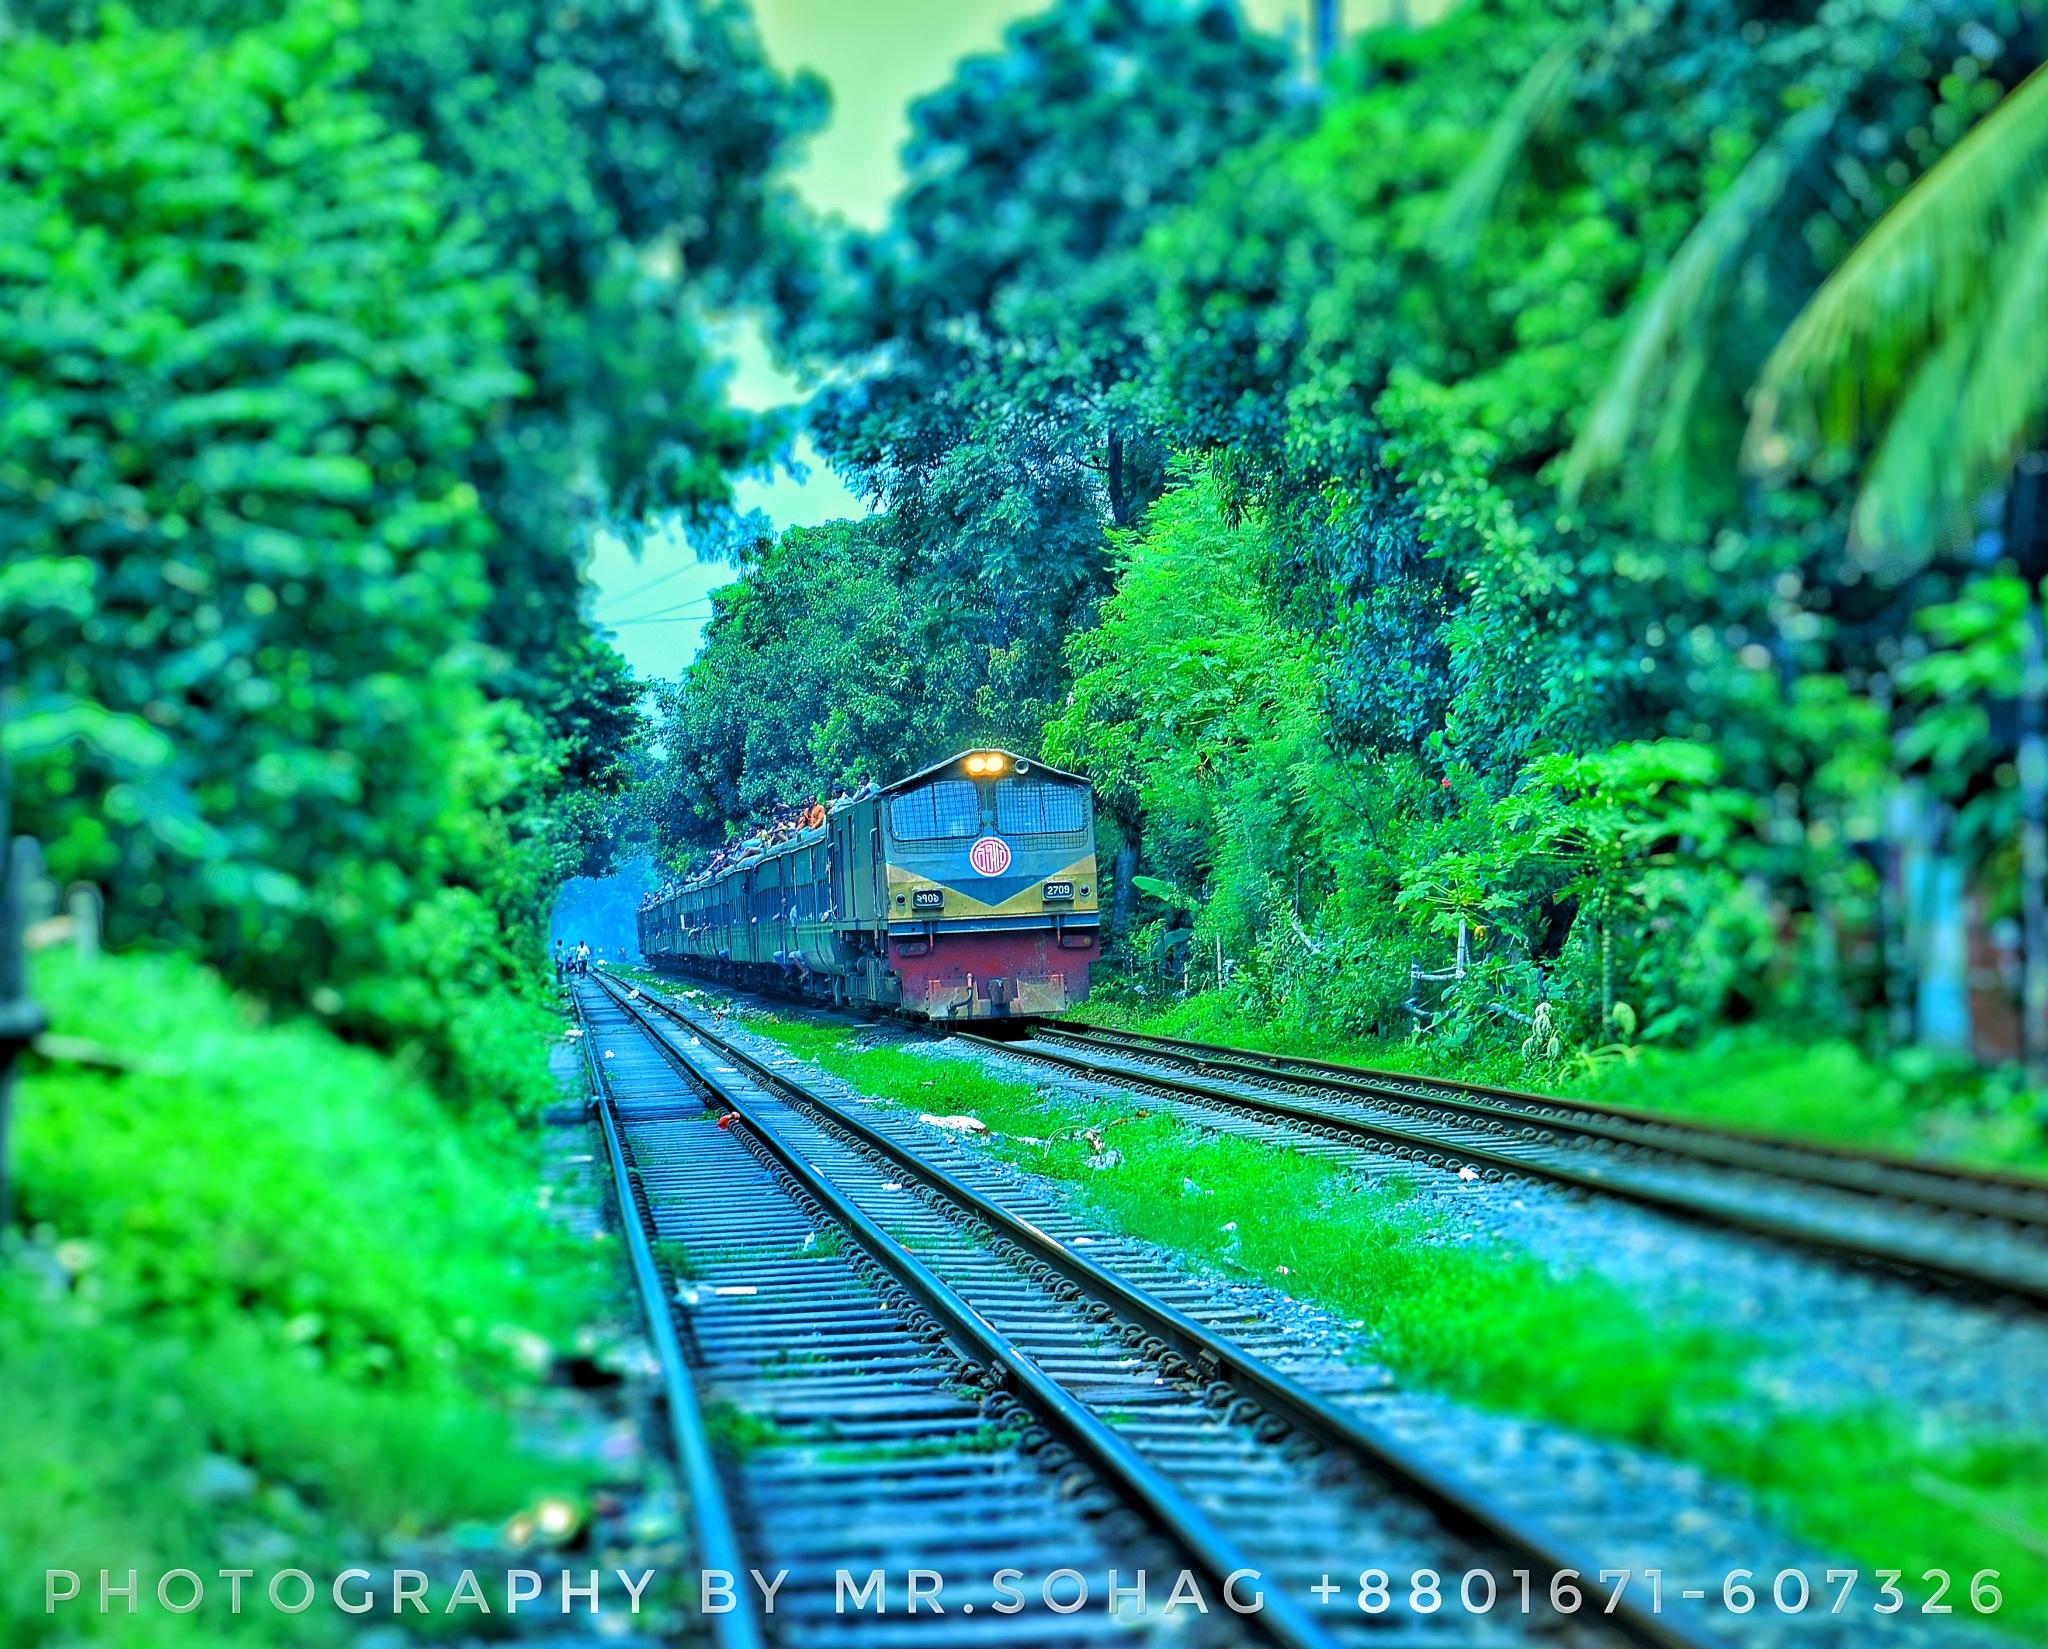 Lonely Road by Moshiur Rahman Sohag